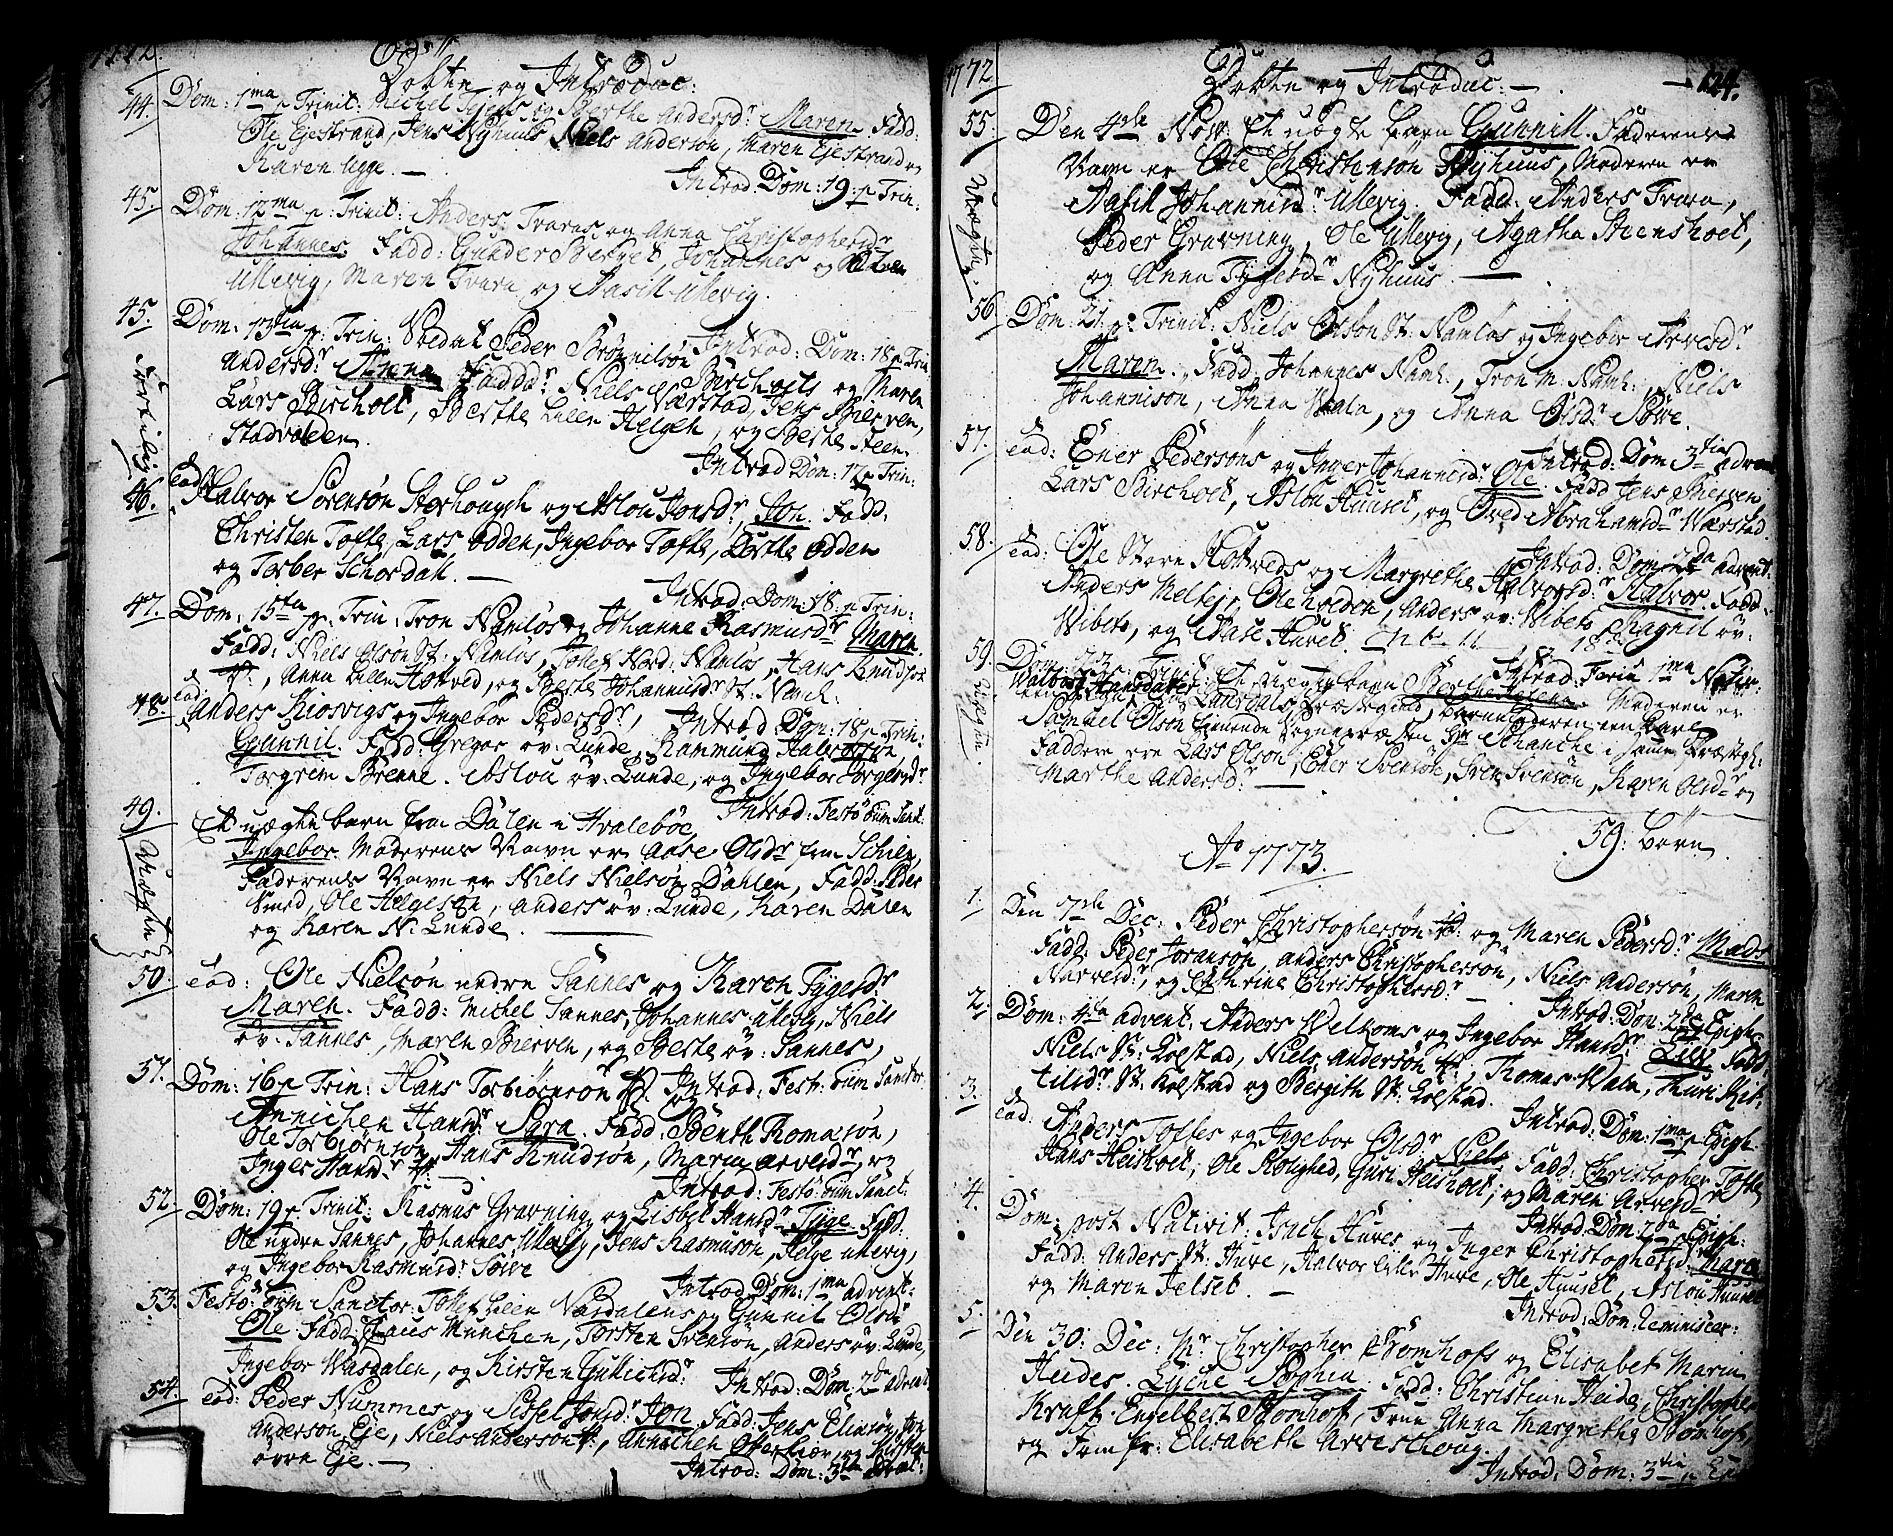 SAKO, Holla kirkebøker, F/Fa/L0001: Ministerialbok nr. 1, 1717-1779, s. 124